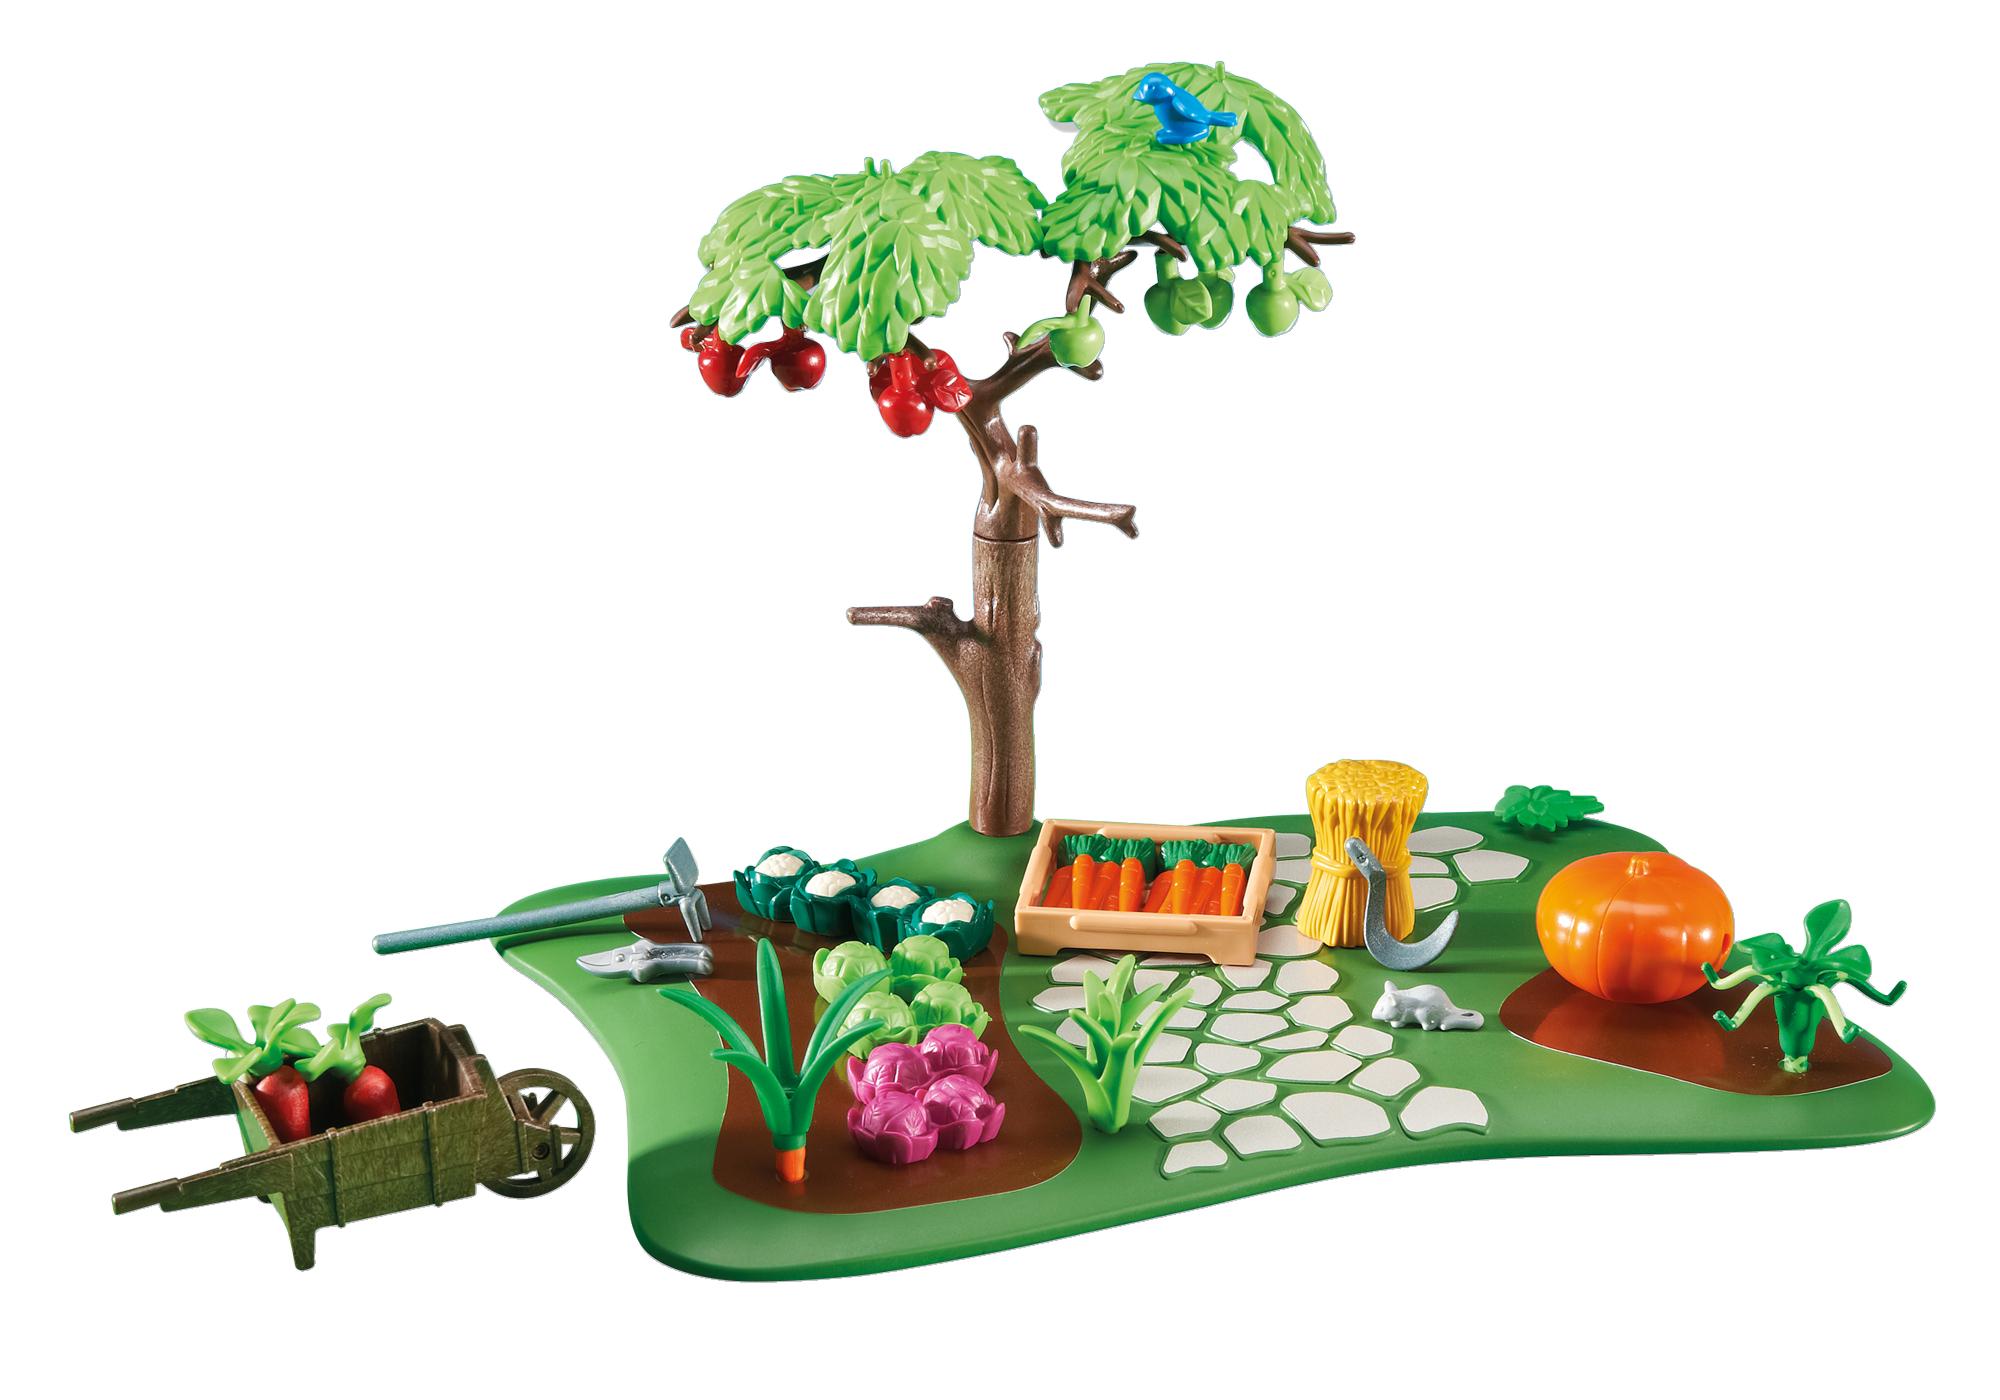 http://media.playmobil.com/i/playmobil/6417_product_detail/Obst- und Gemüsegarten